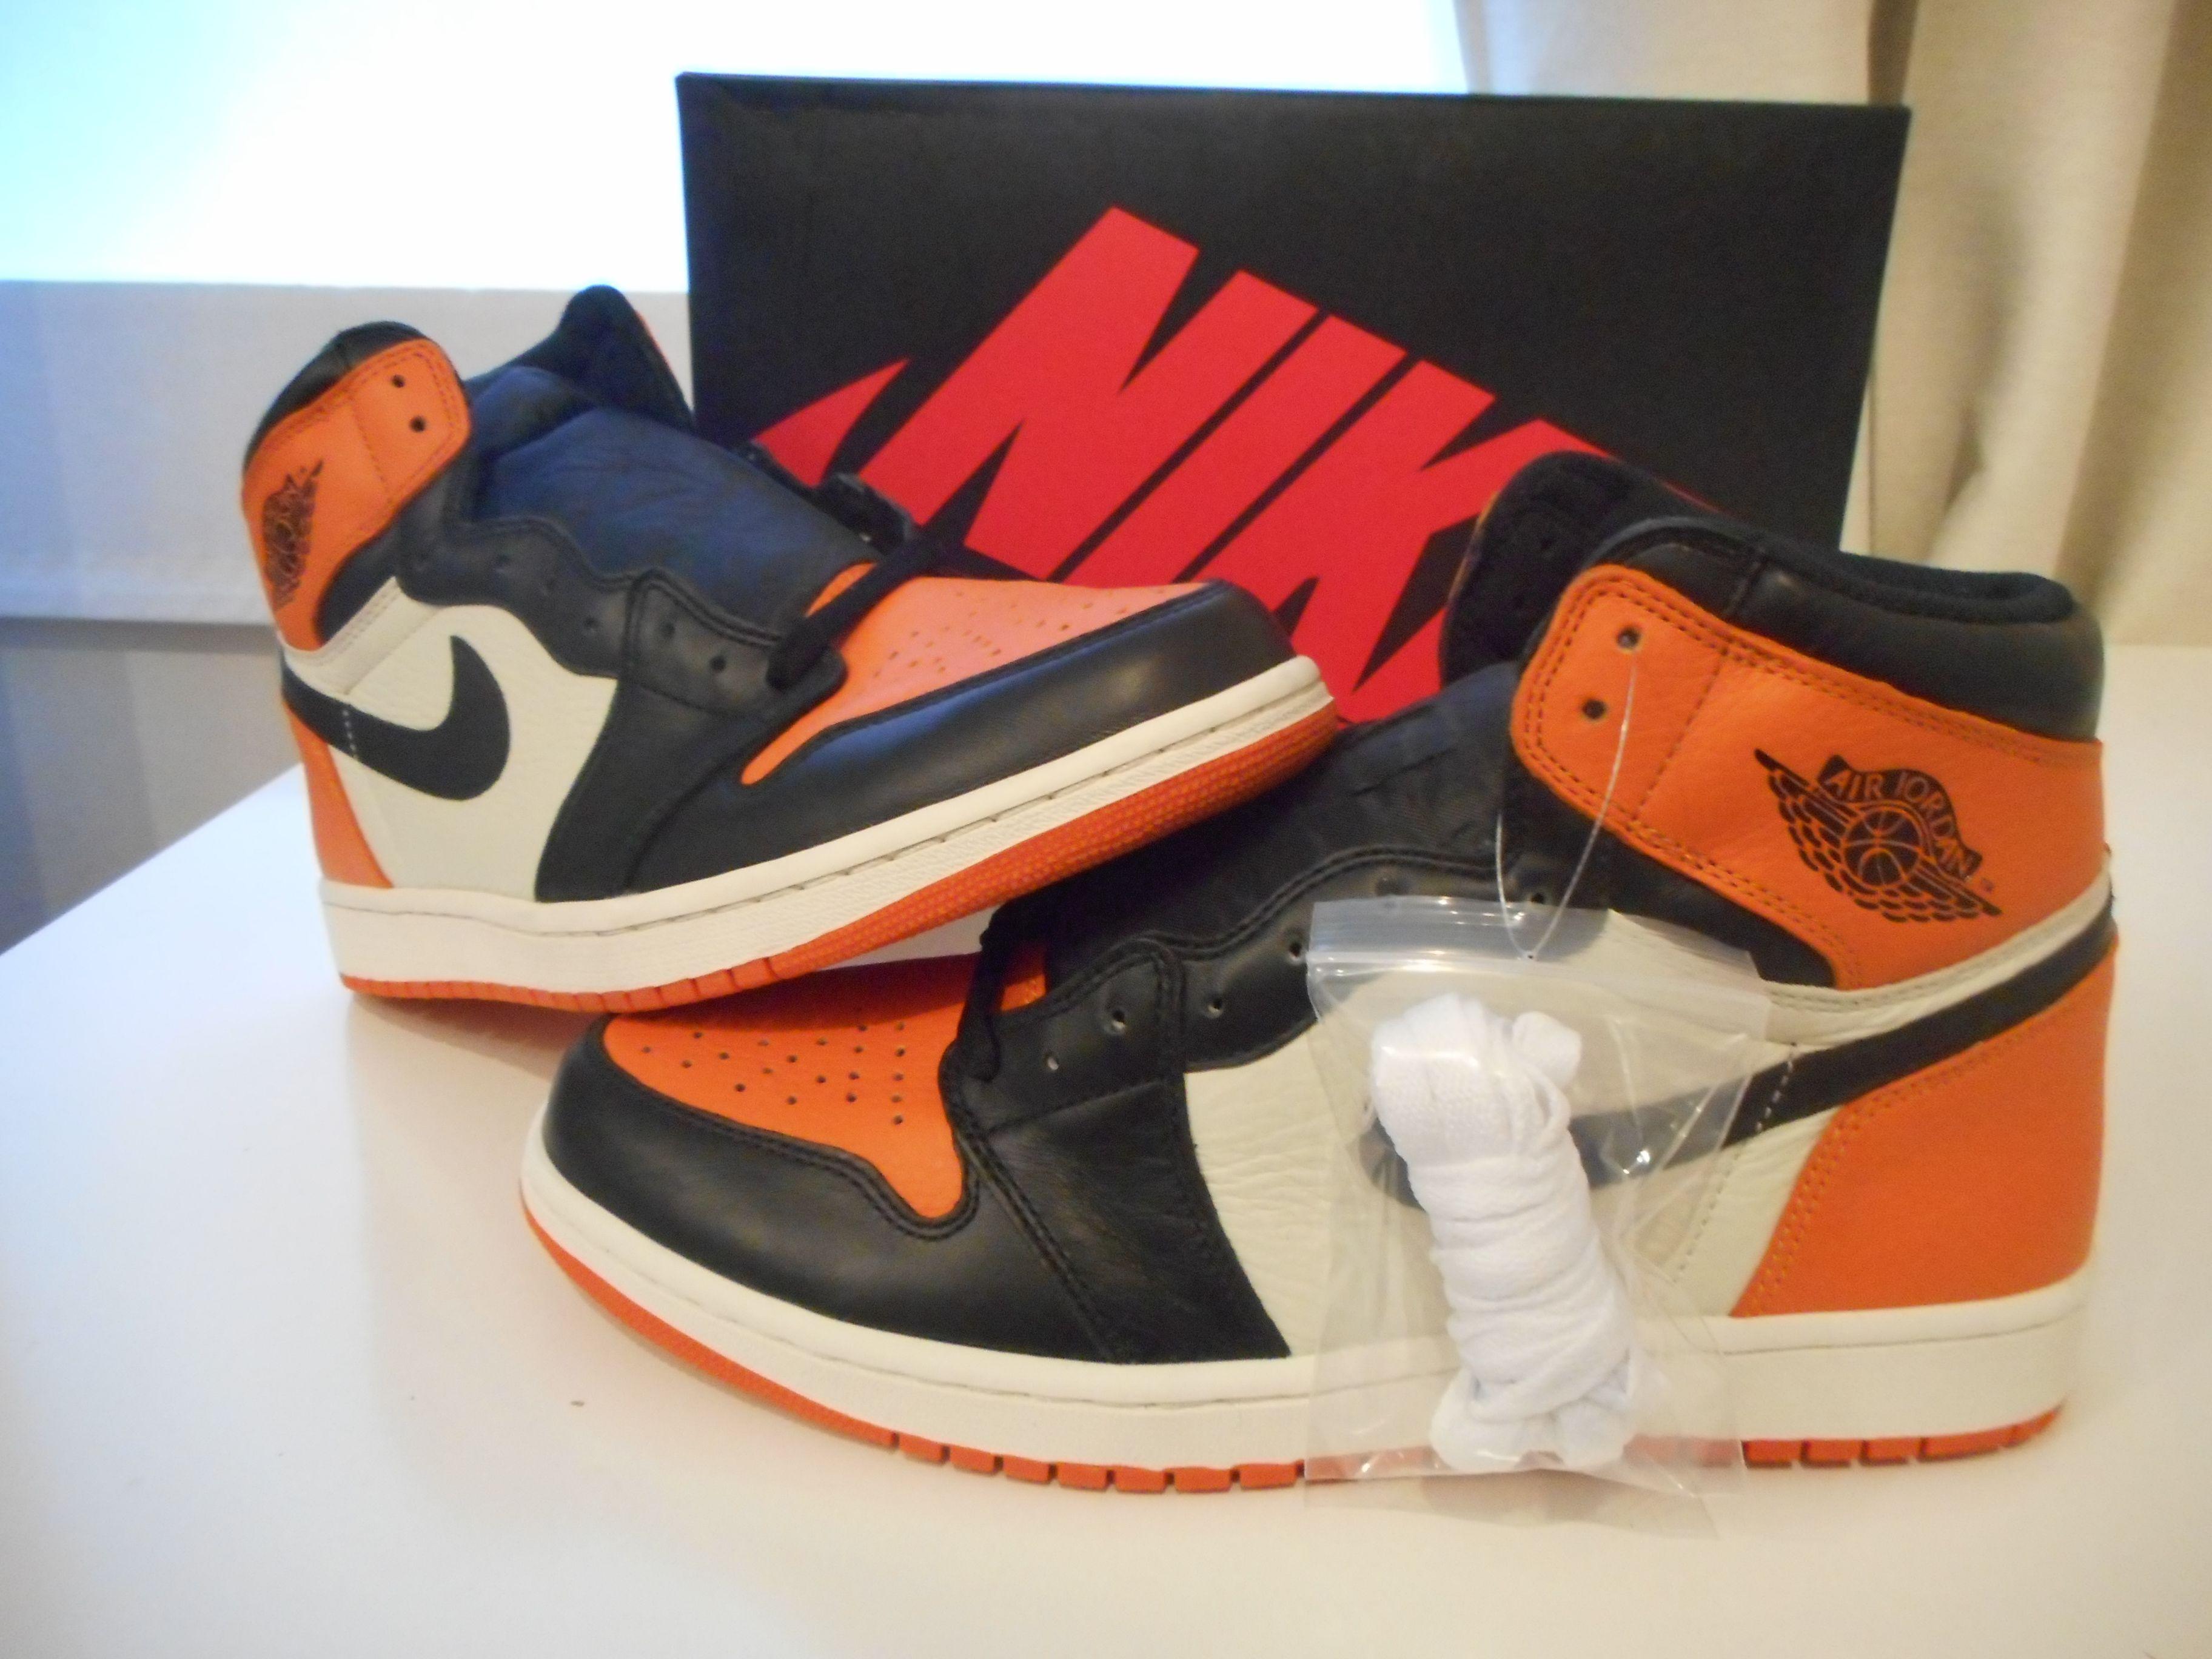 BNIB Air Jordan 1 Retro High SBB Shattered Backboards Shoes Mens Size 11  New DS